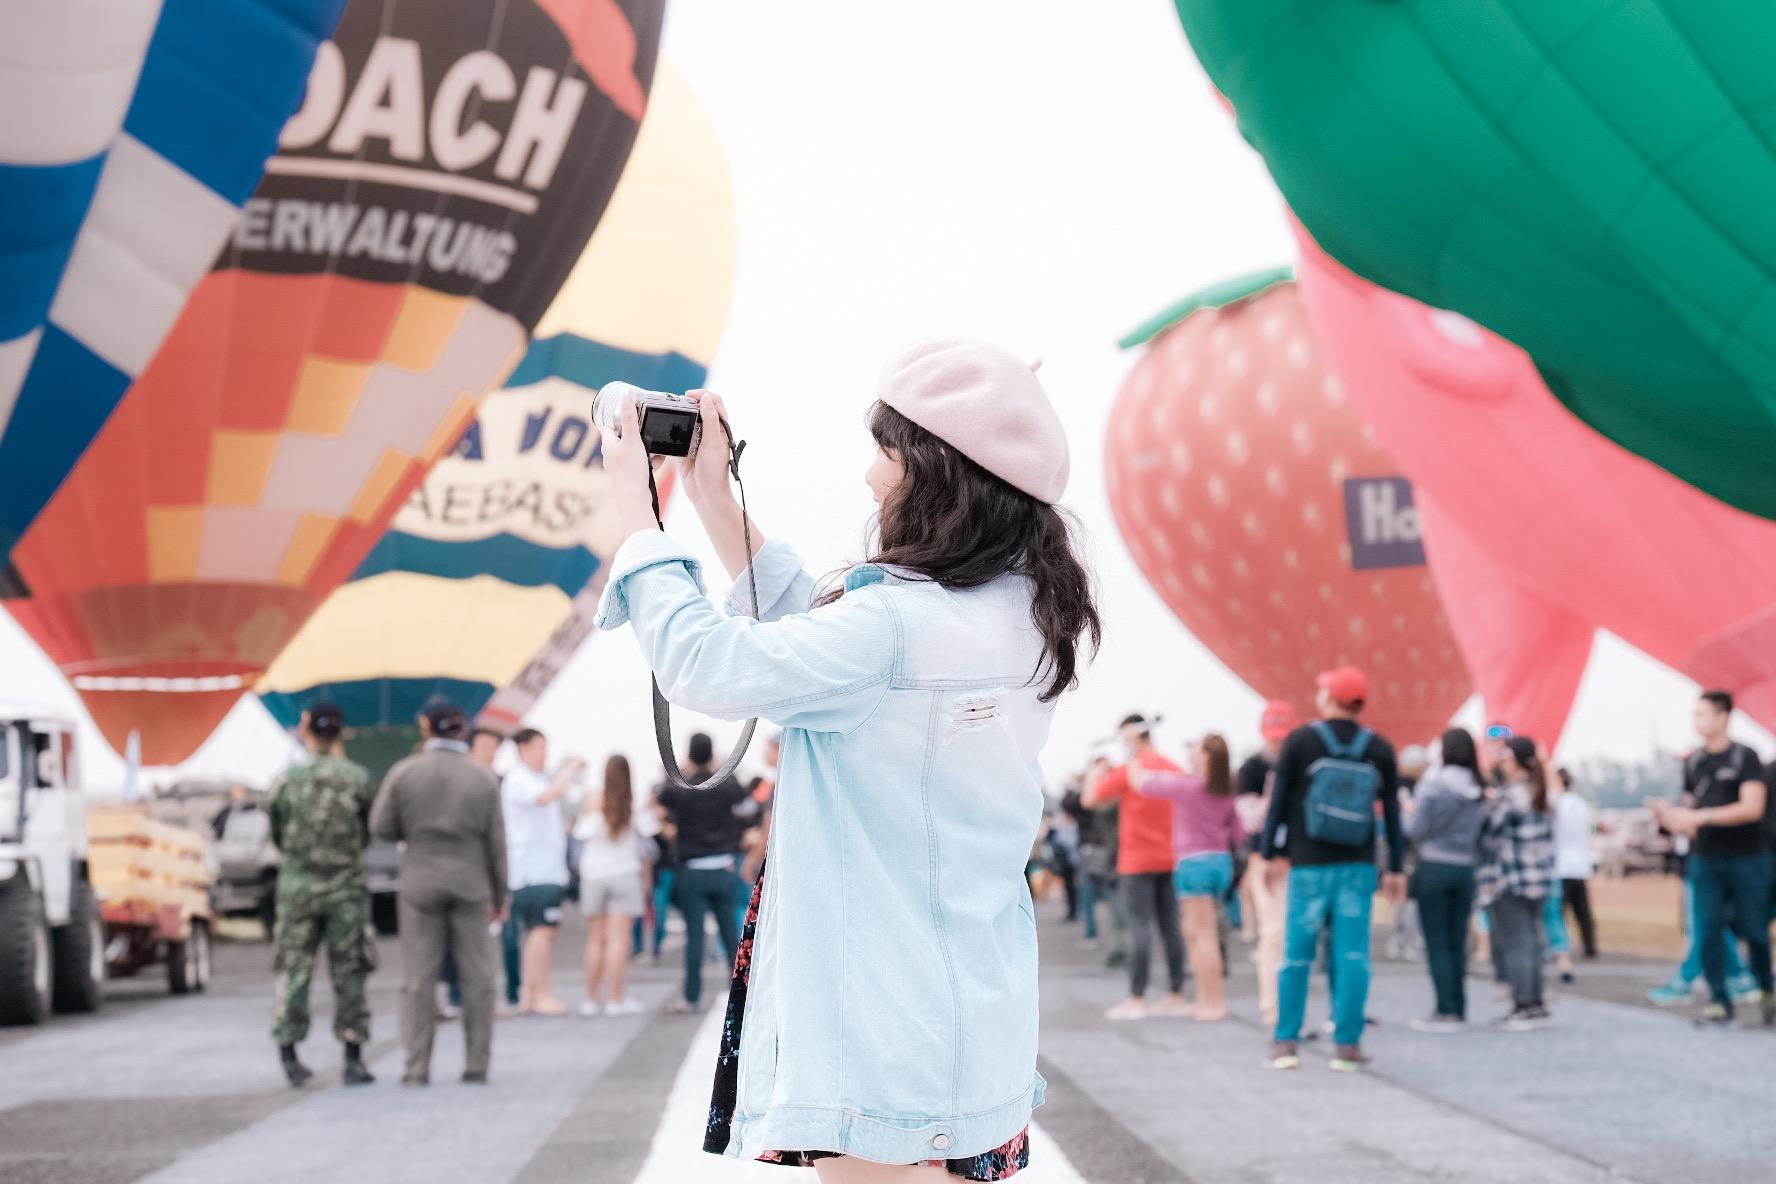 Philippine International Hot Air Balloon Festival 06.jpg